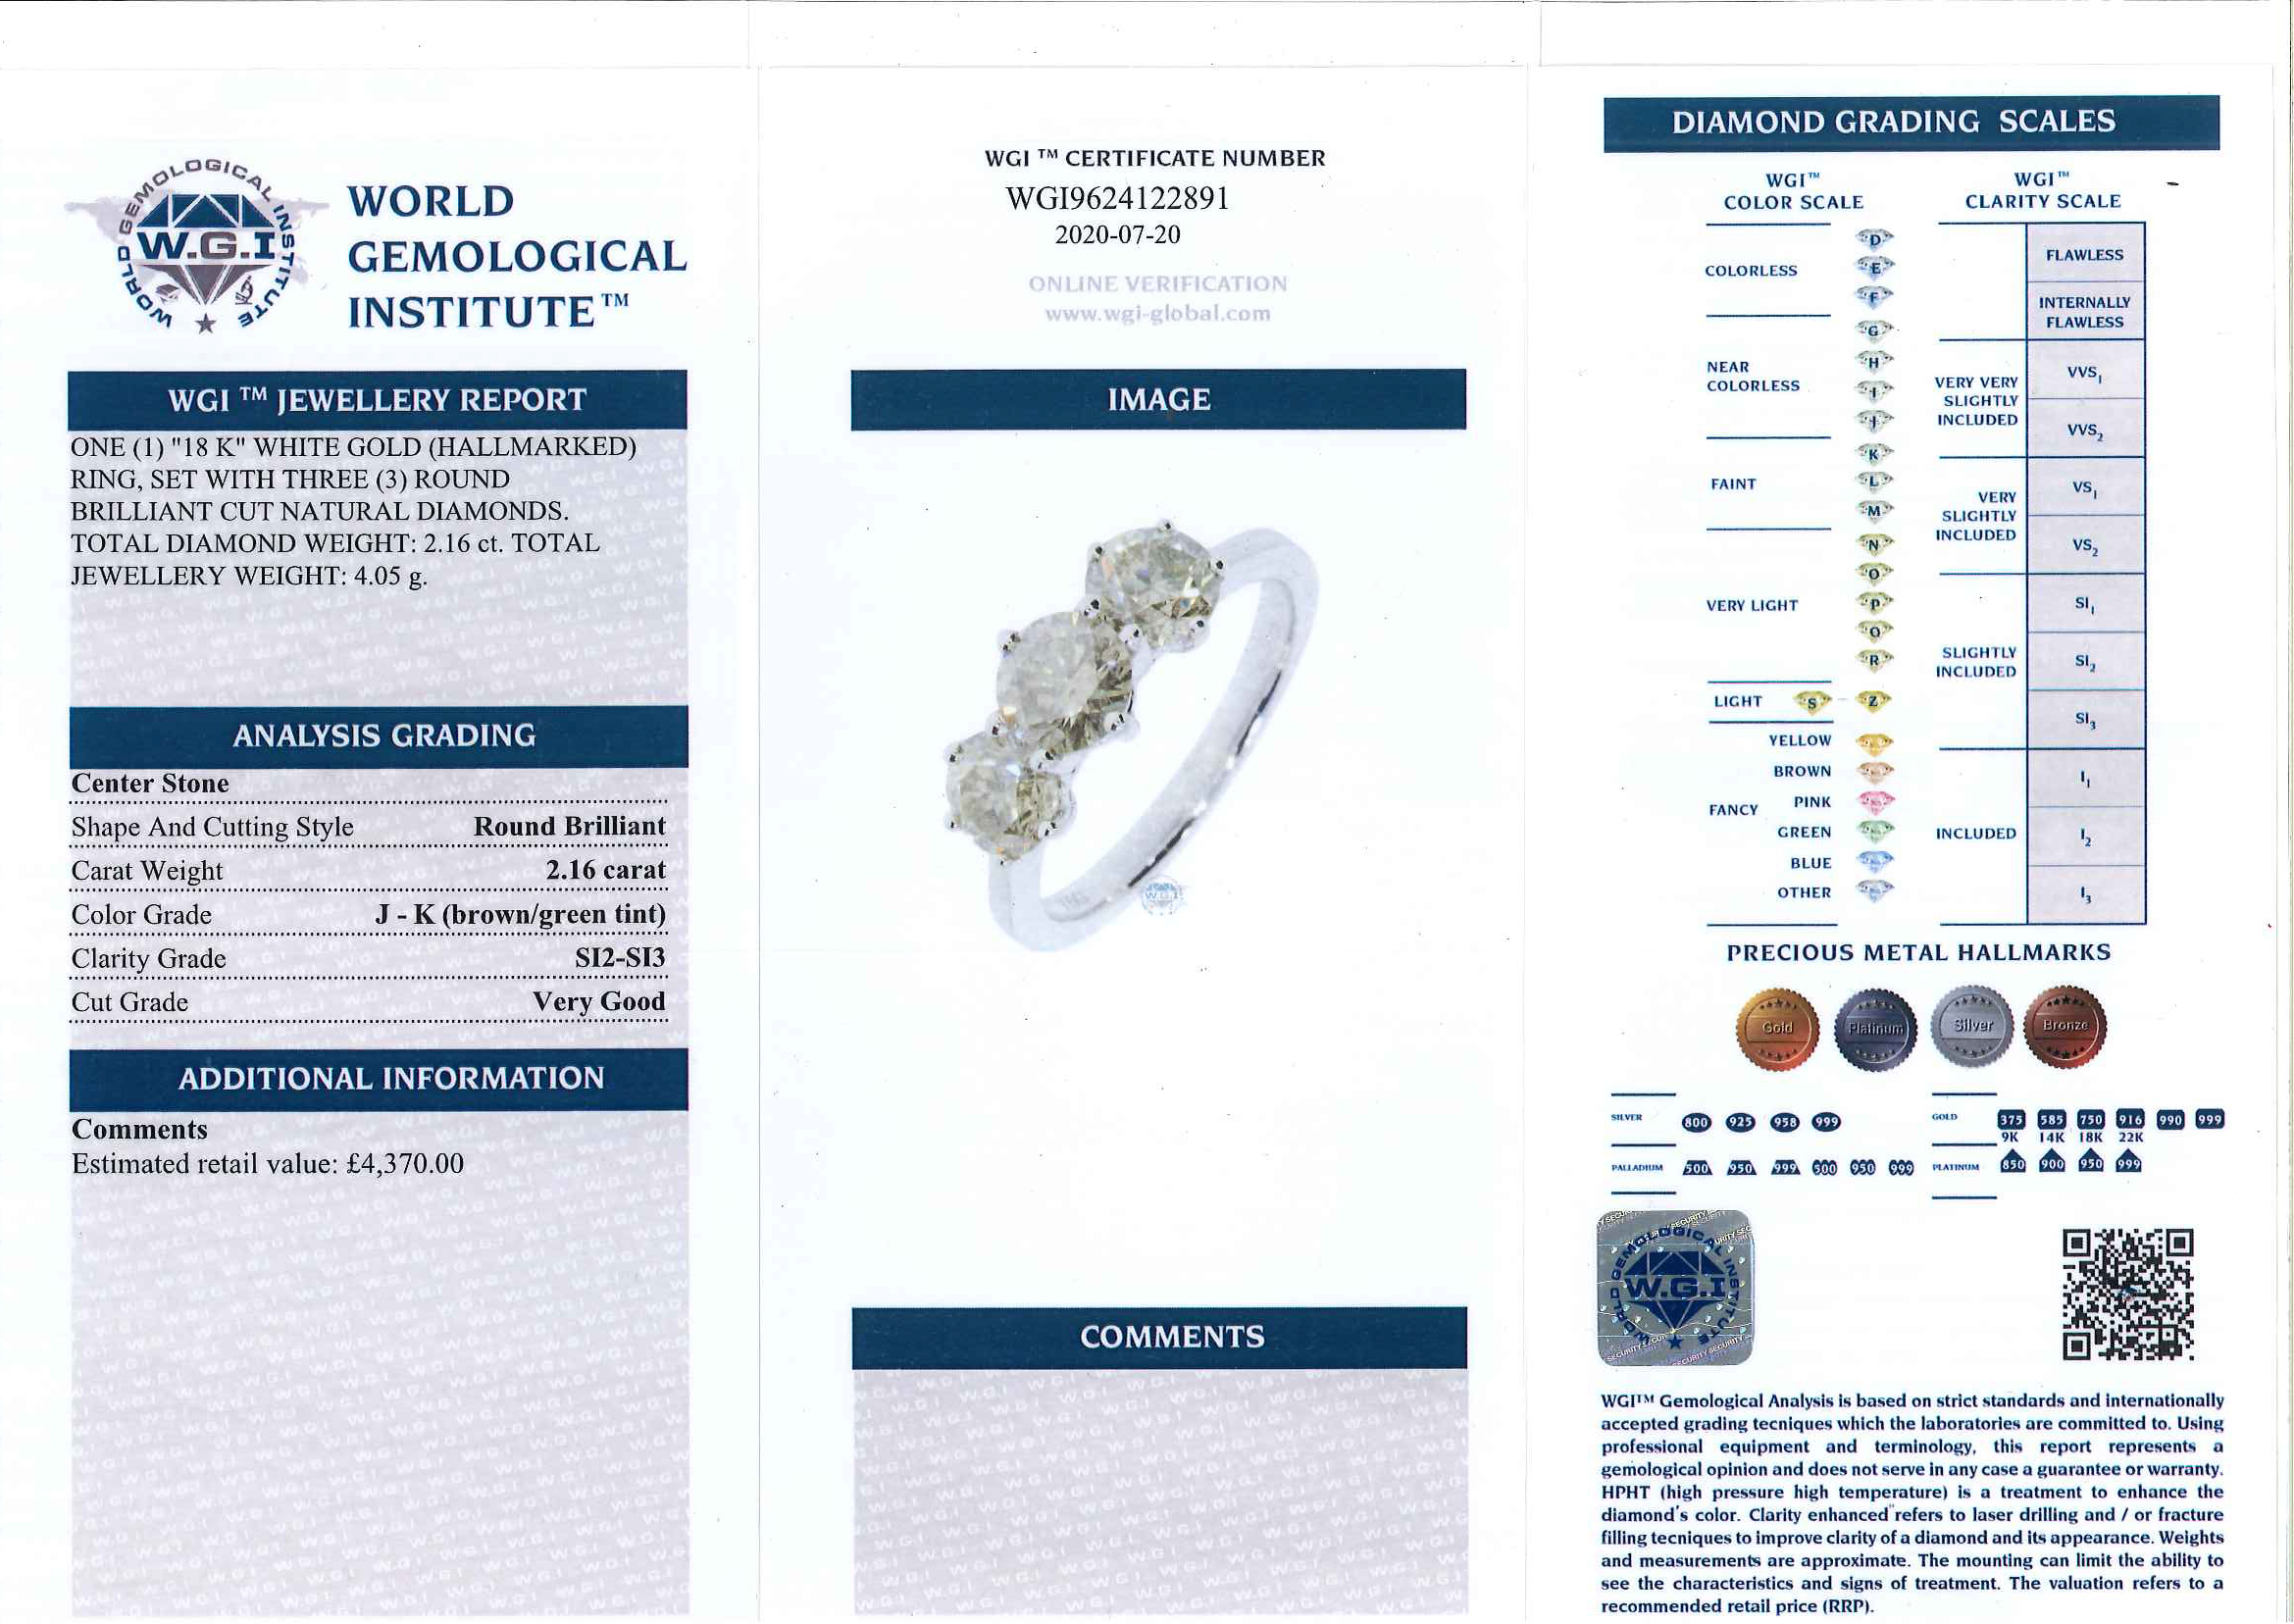 18ct white gold three stone round brilliant cut diamond ring, total diamond weight 2.16 carat, - Image 7 of 7